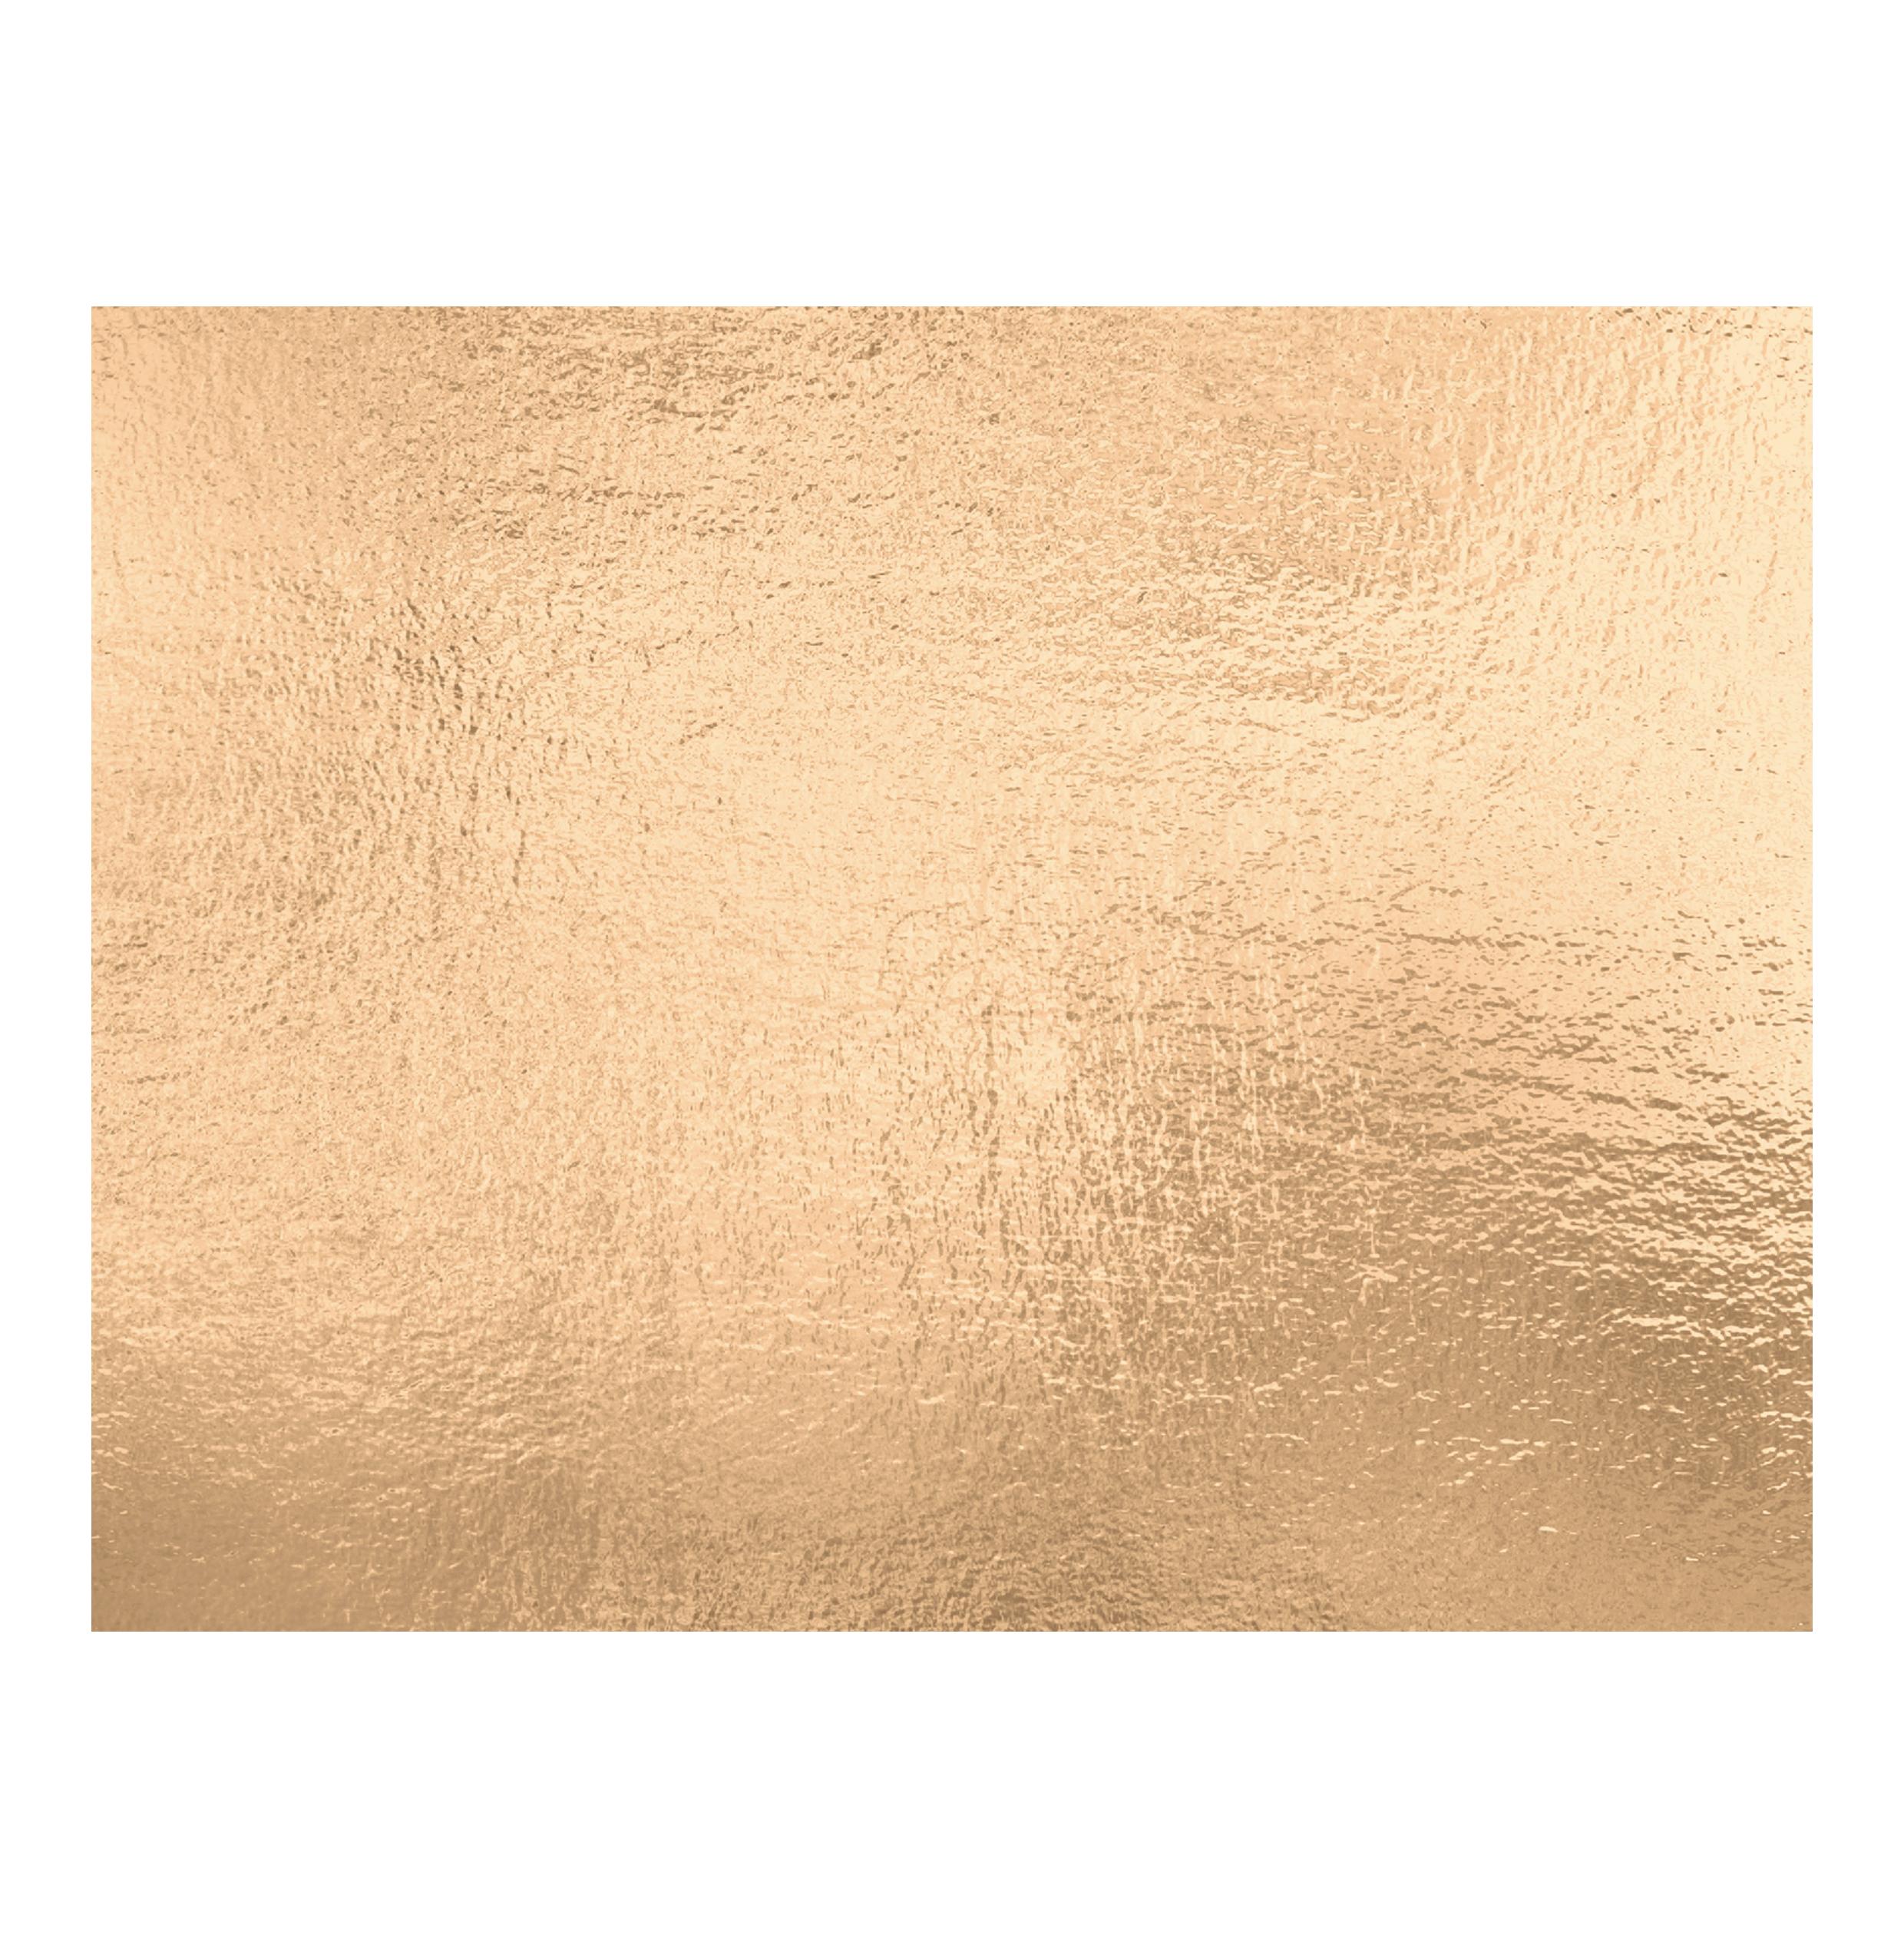 Carlie Maree